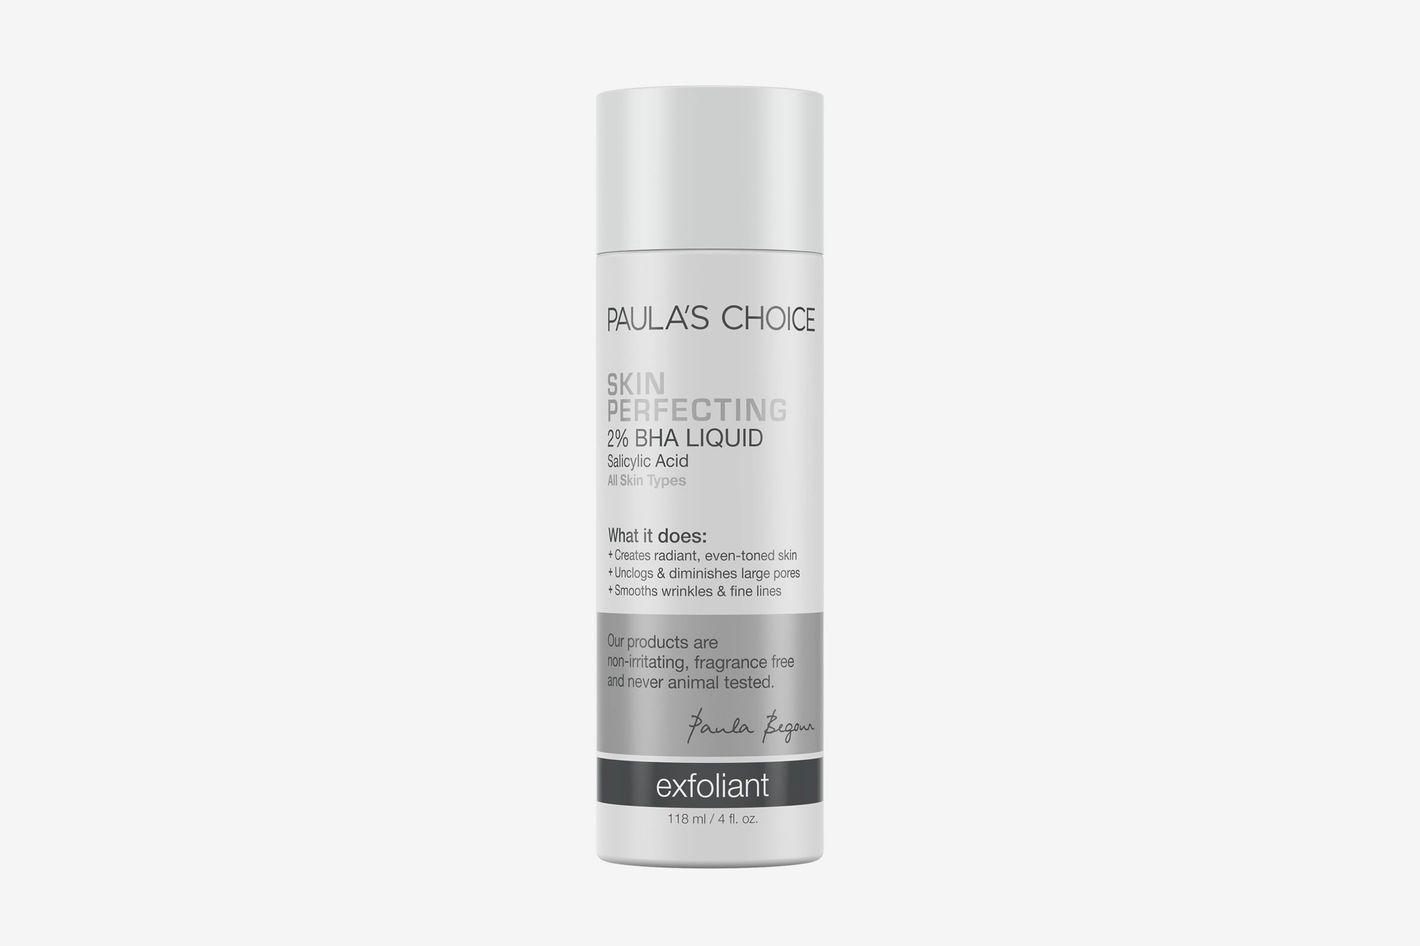 Paulas Choice Skin Perfecting 2% BHA Liquid Salicylic Acid Exfoliant